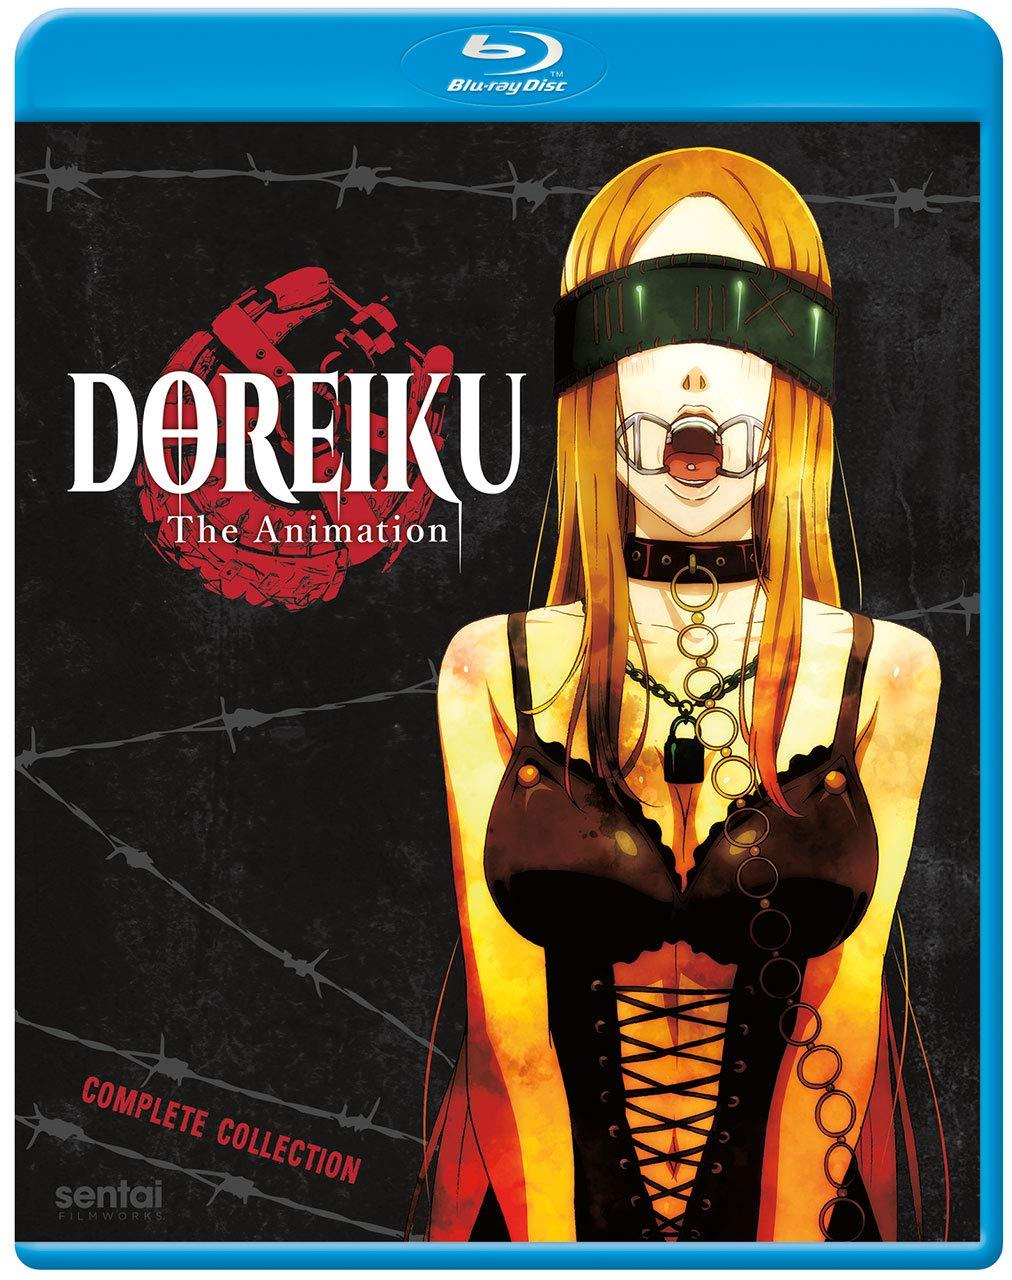 Doreiku The Animation Blu-ray (Dual Audio)